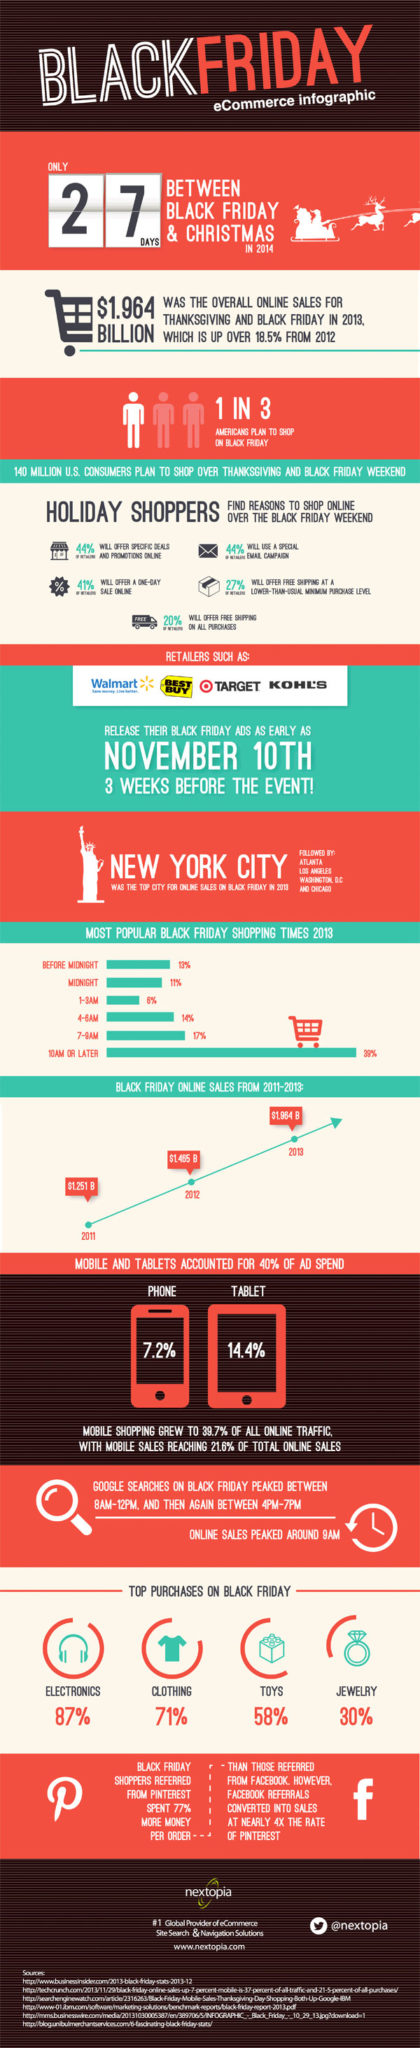 black-friday-infographic